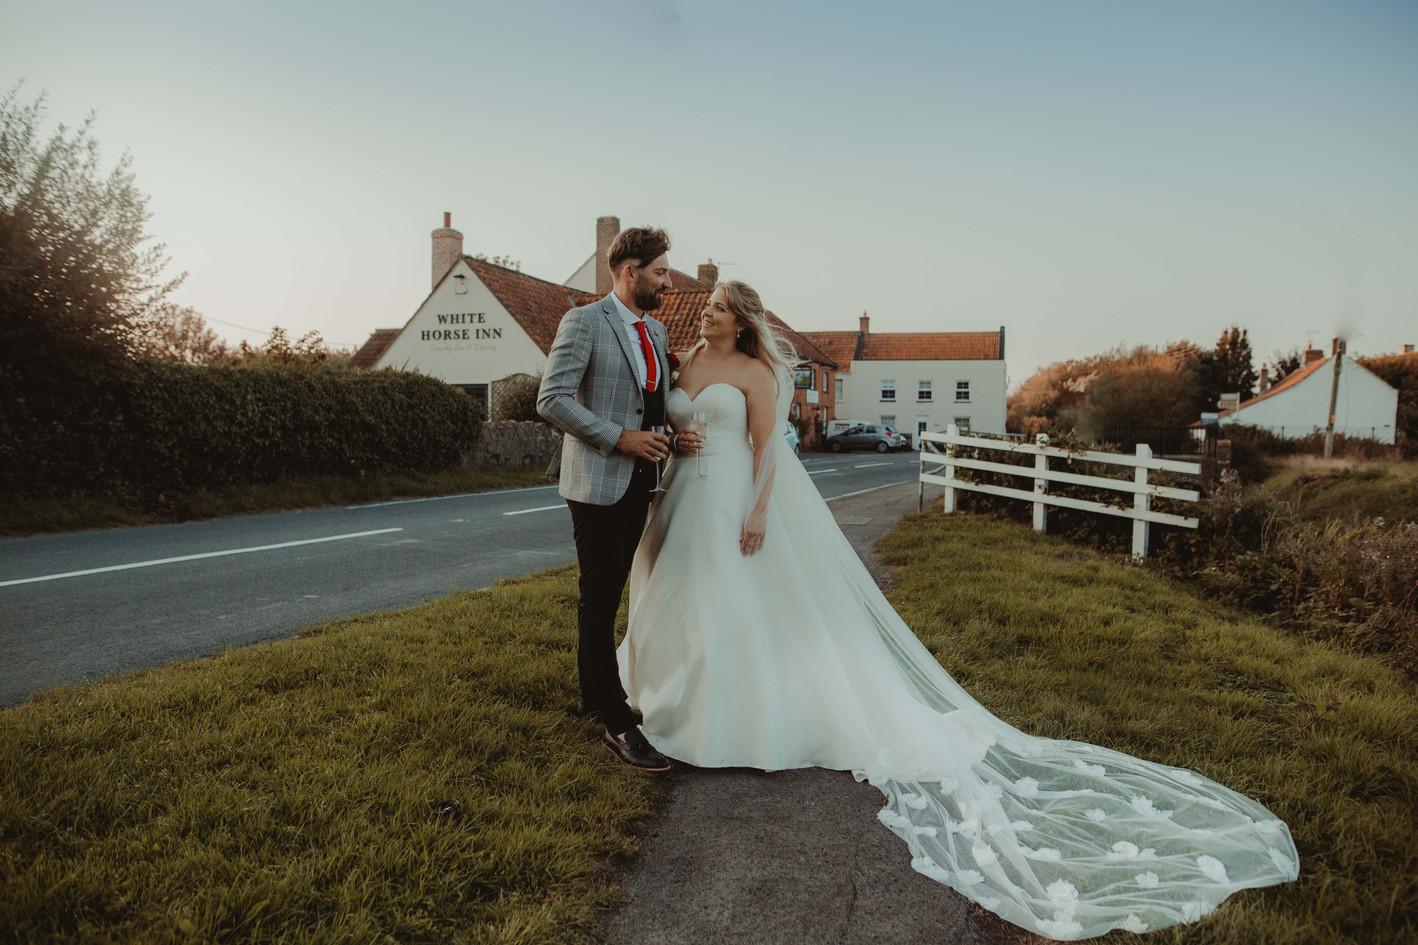 White Horse Inn Mark Somerset Country Pub Wedding